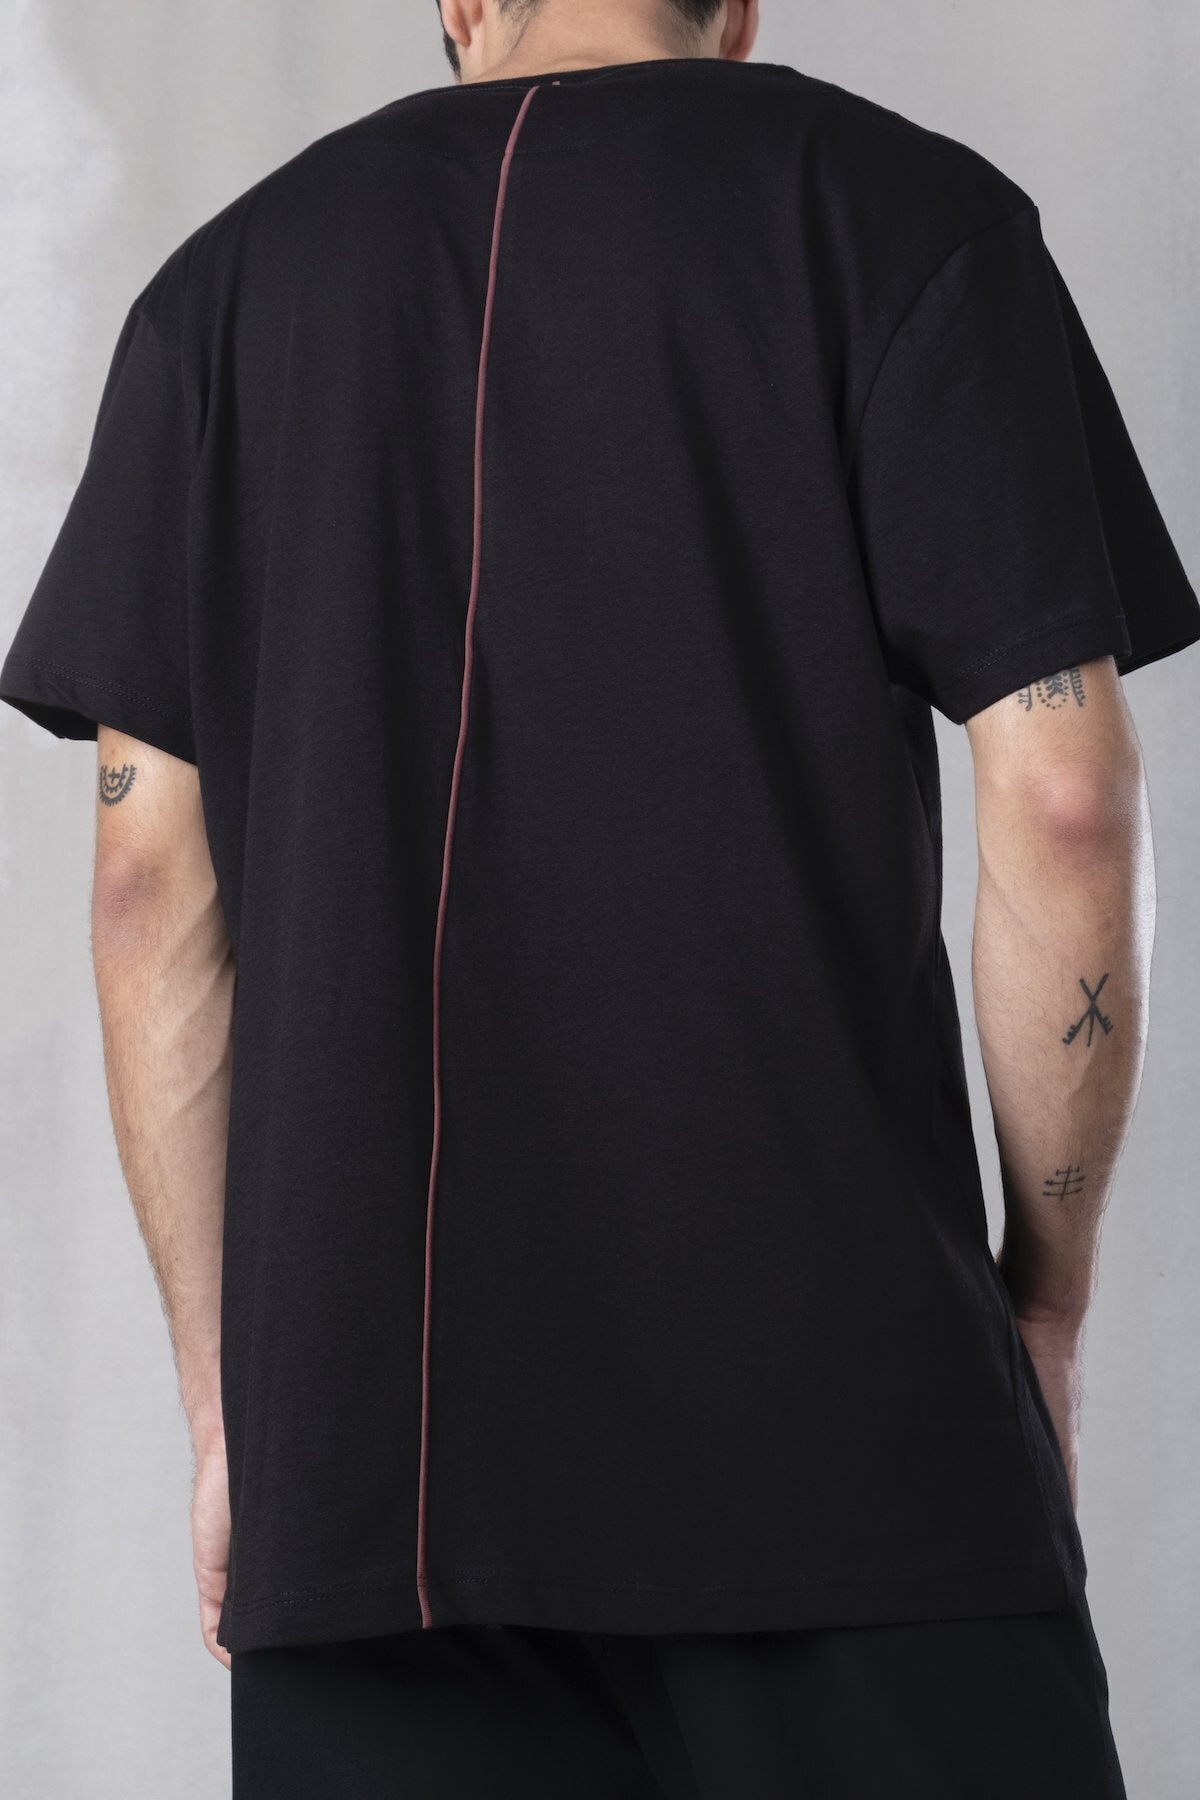 tinbasic Erkek Siyah Sırt Detaylı %100 Pamuk Örmek Bisiklet Yaka Oversize T-shirt 1